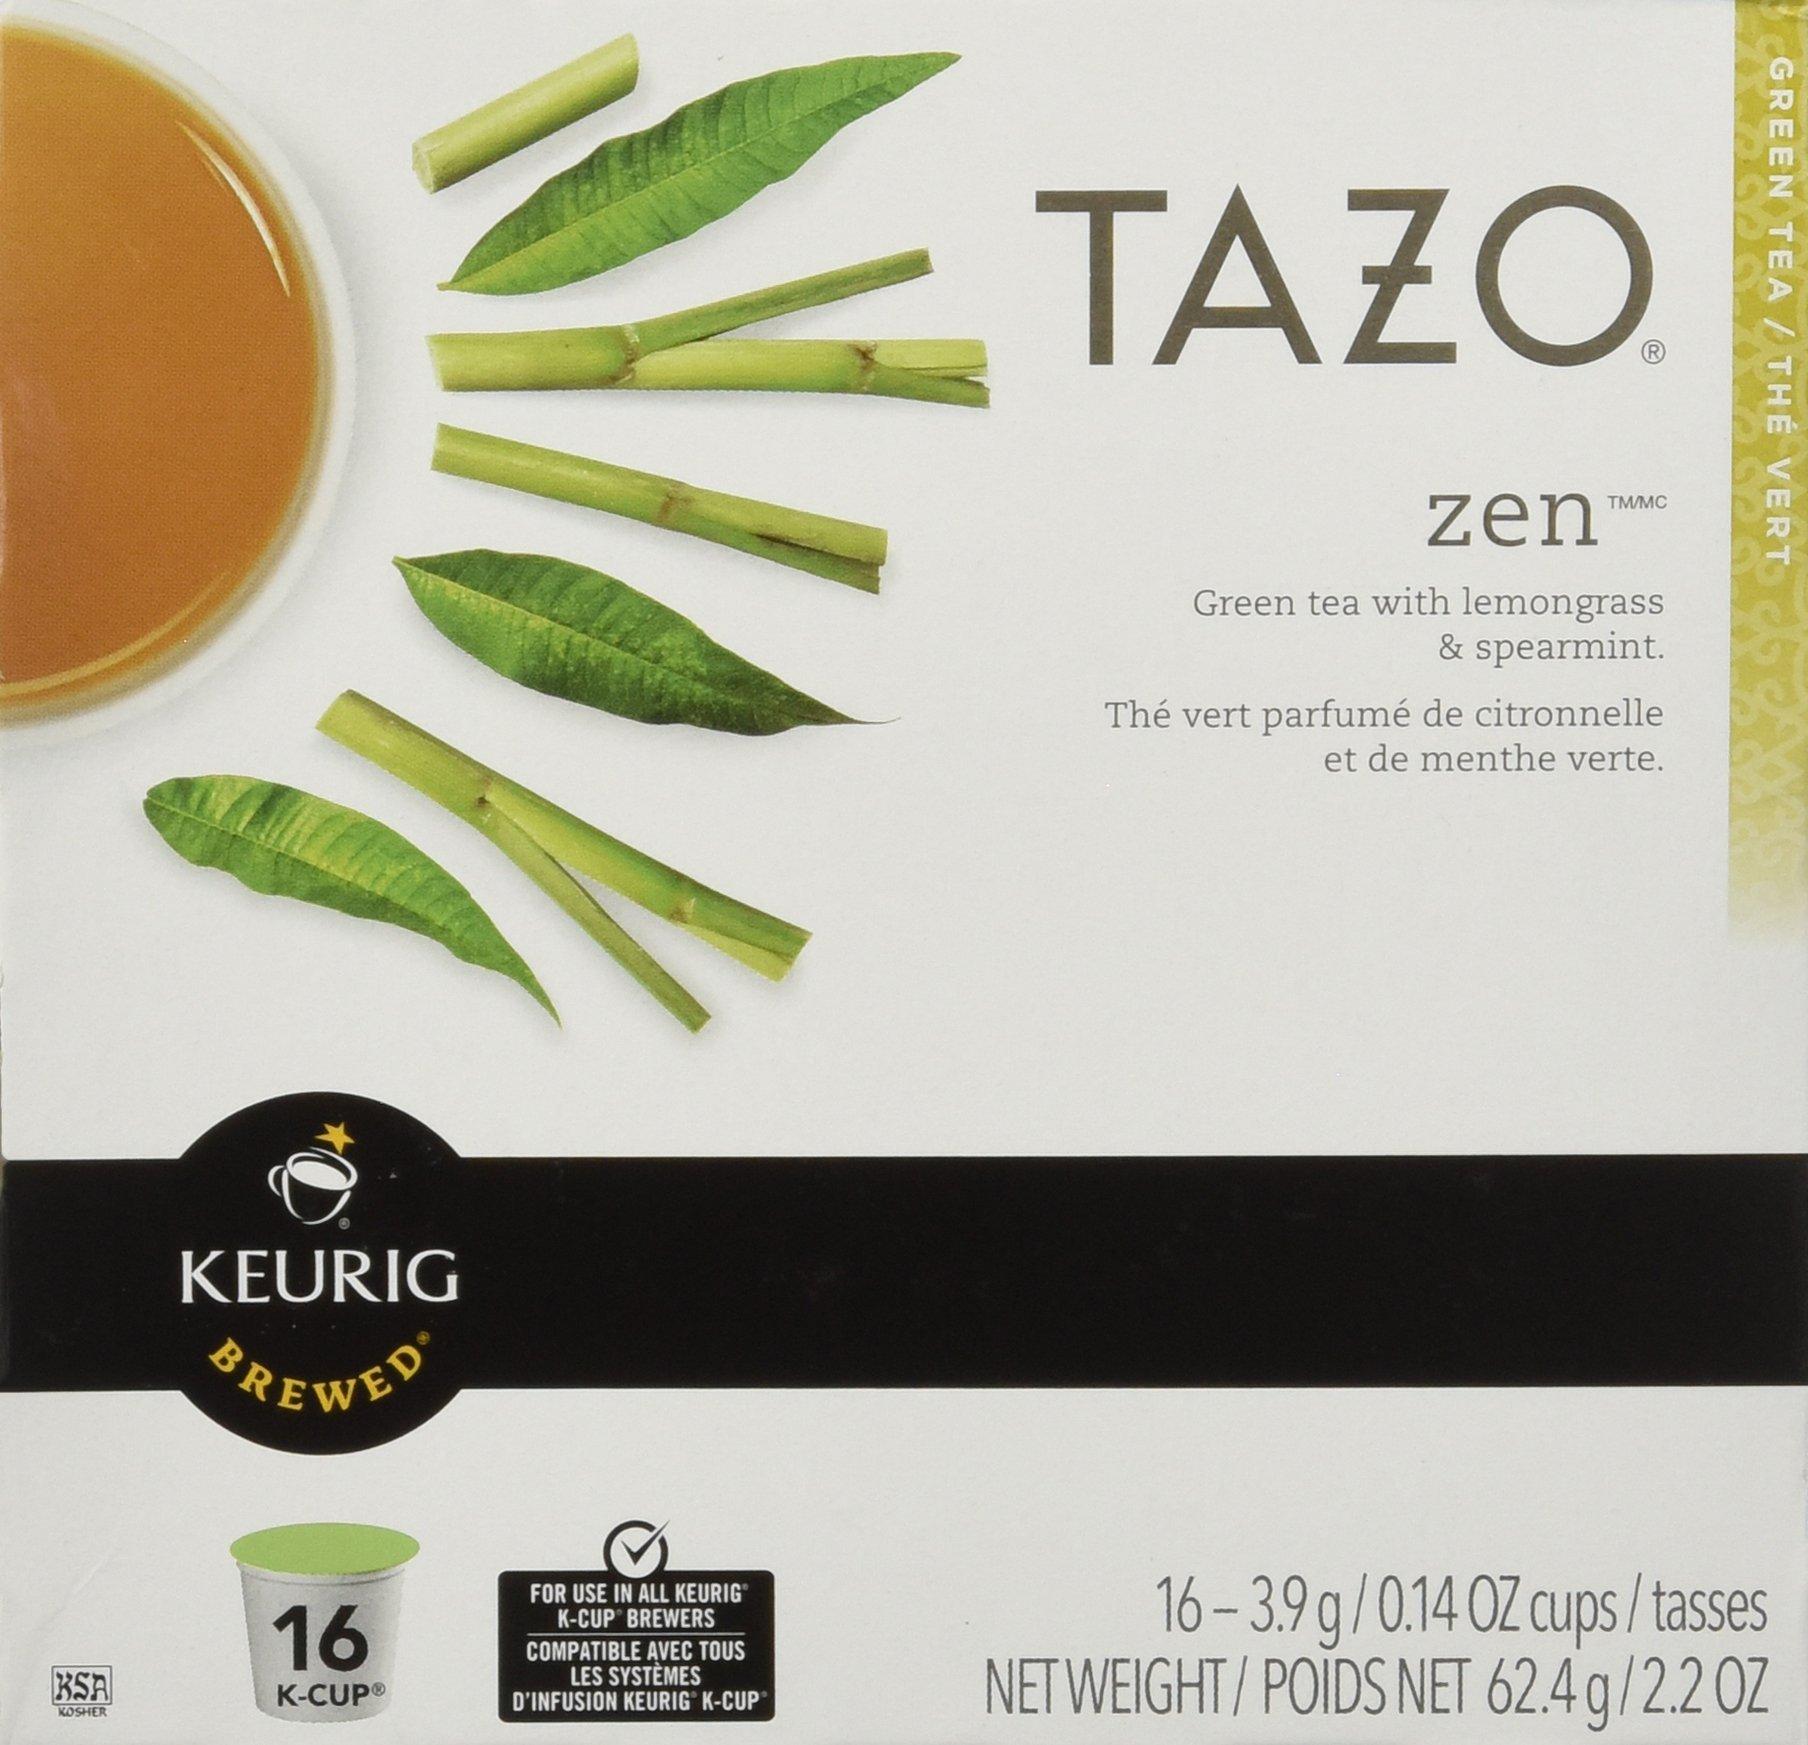 Keurig Tazo Zen Tea 32-Count K-Cups for Keurig Brewers by Starbucks (Image #1)